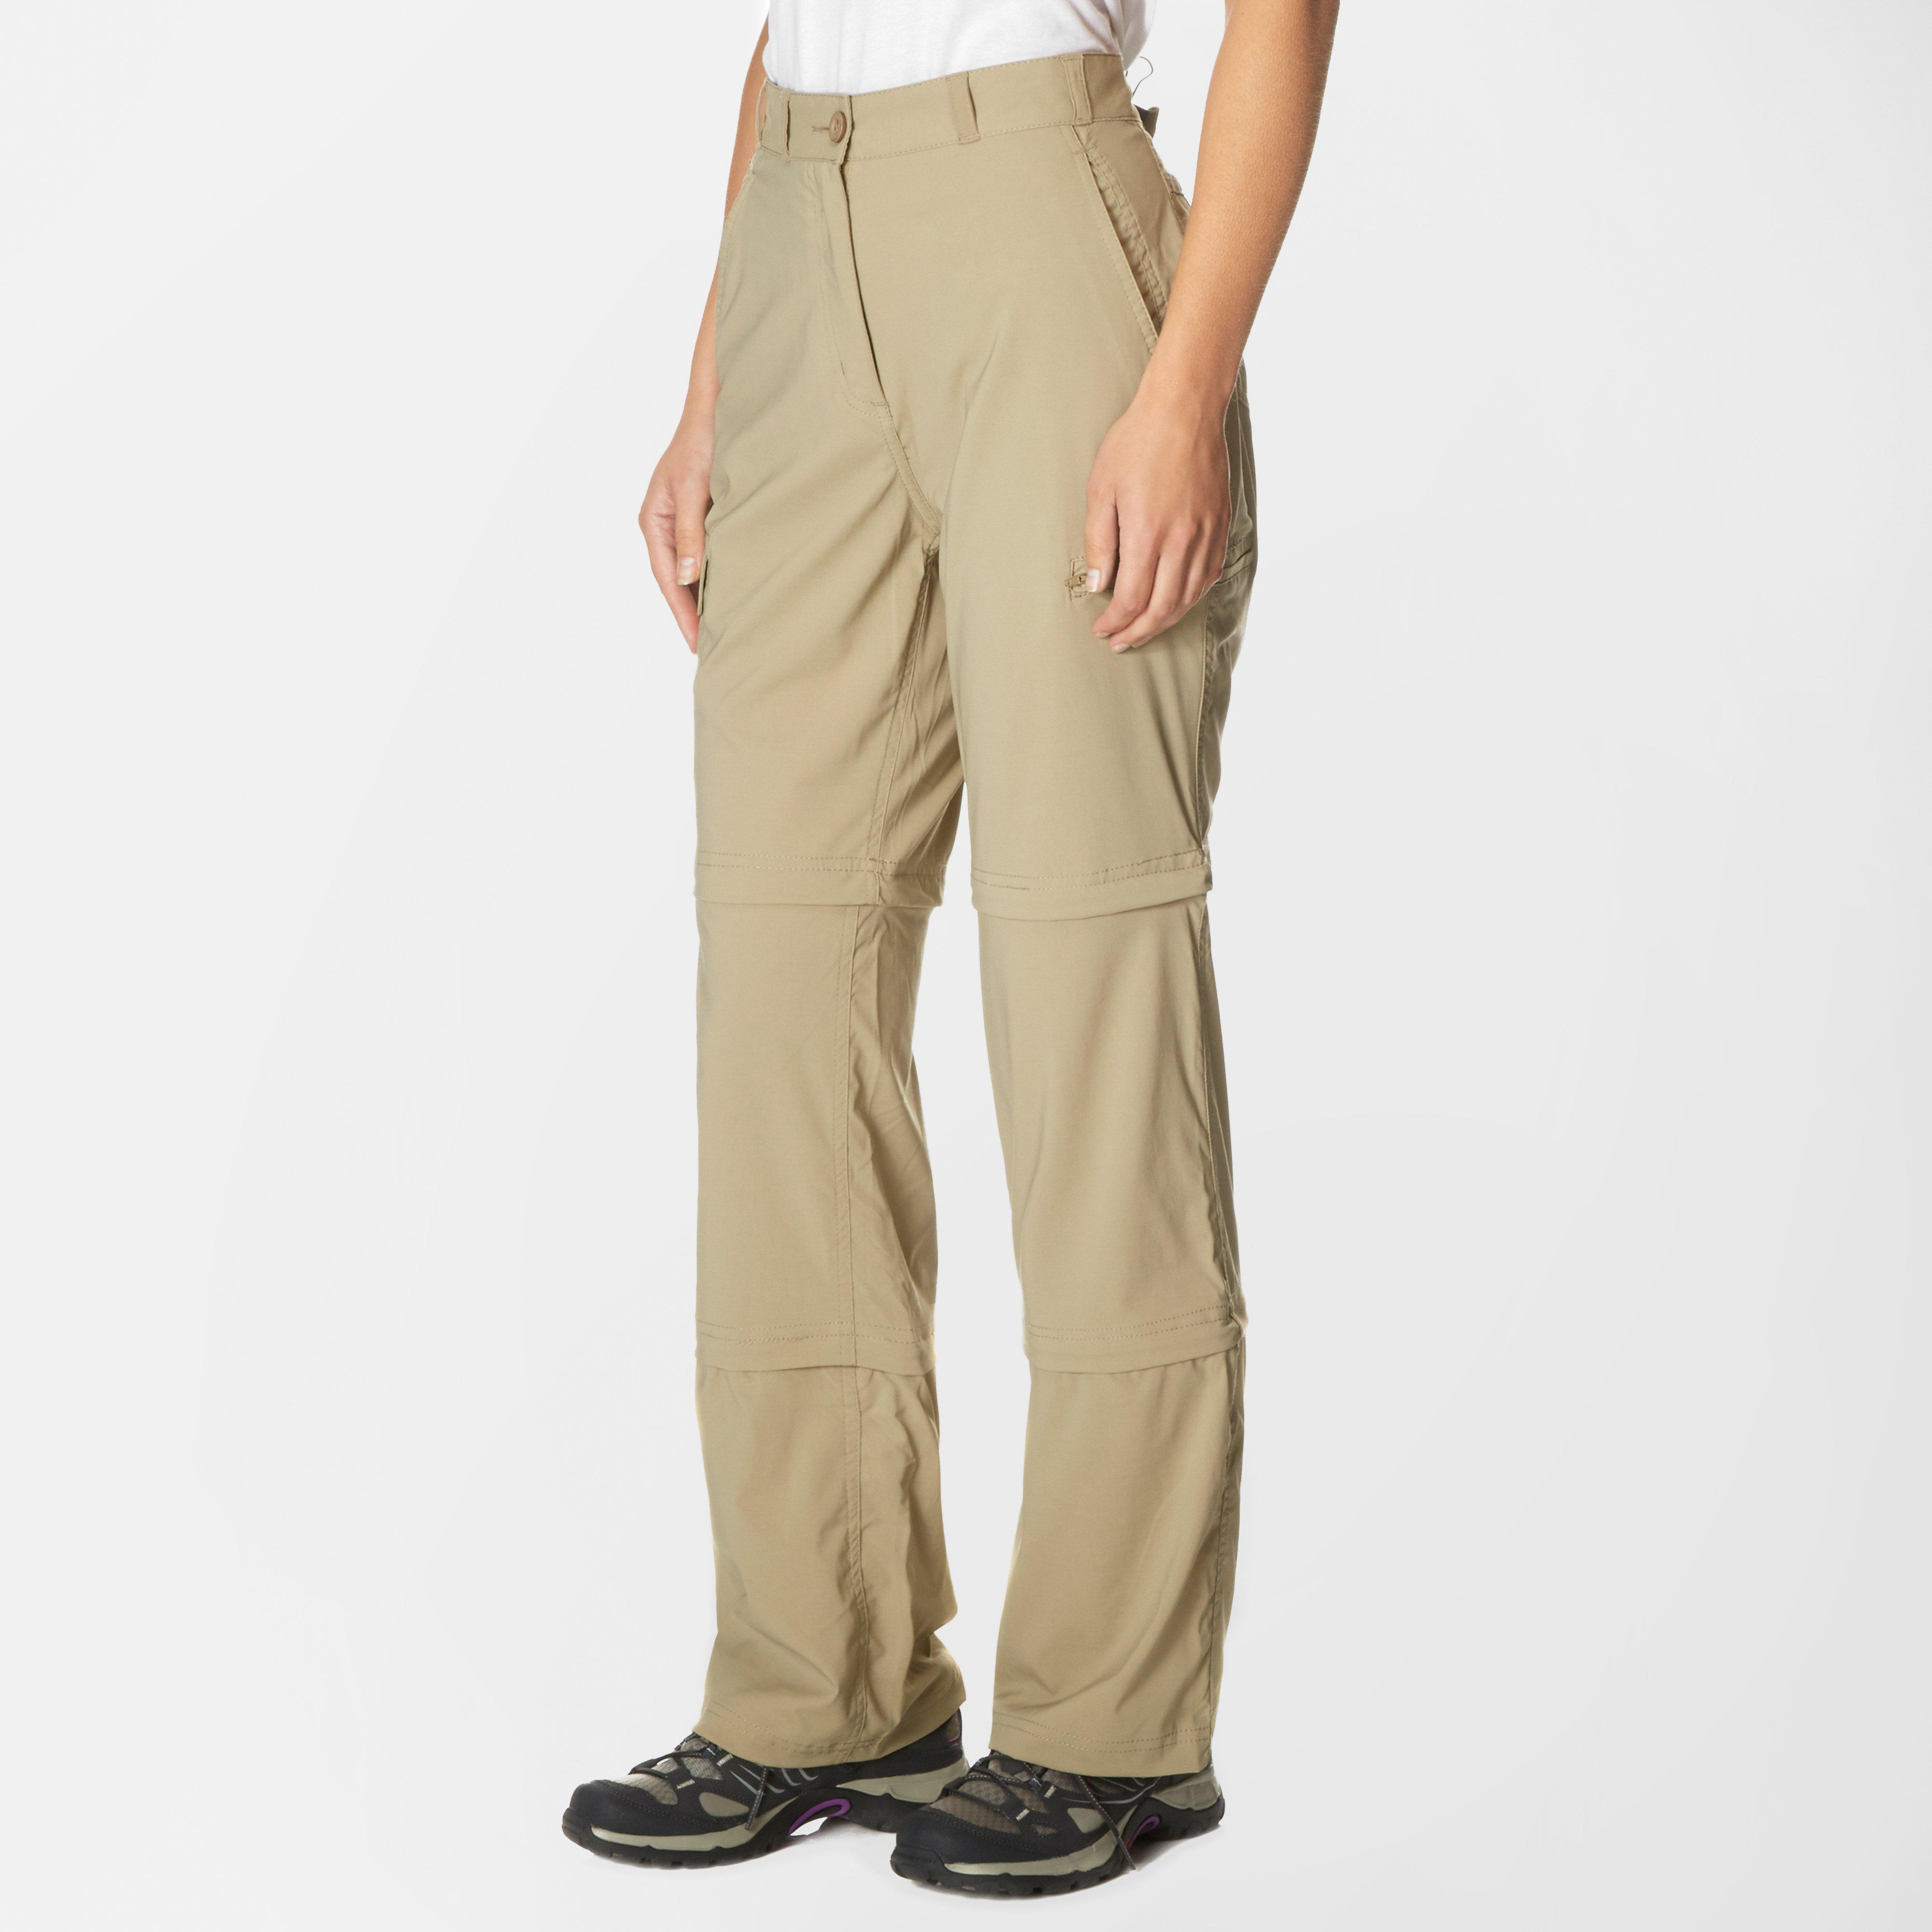 Peter Storm Peter Storm womens Stretch Double Zip Off Trousers - Regular - Beige, Beige